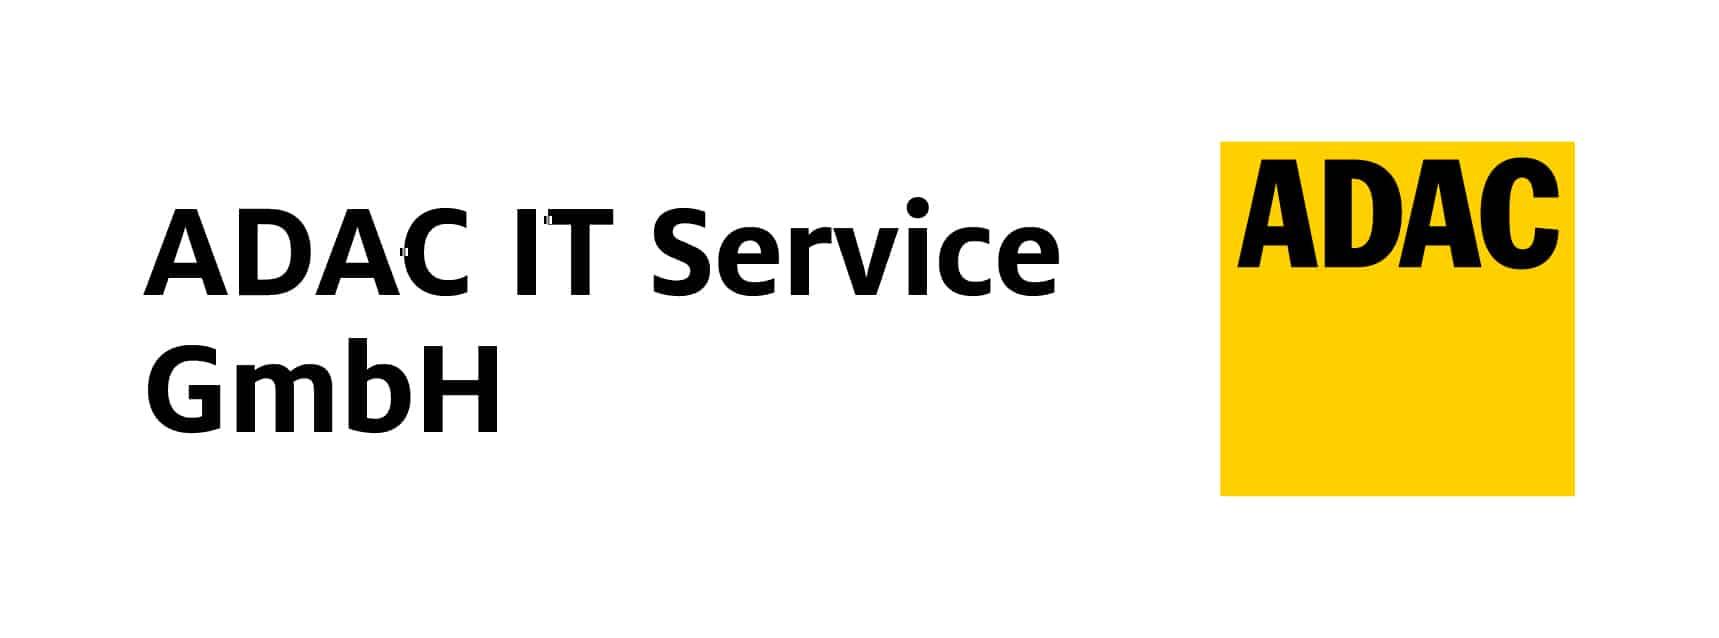 ADAC IT Service GmbH